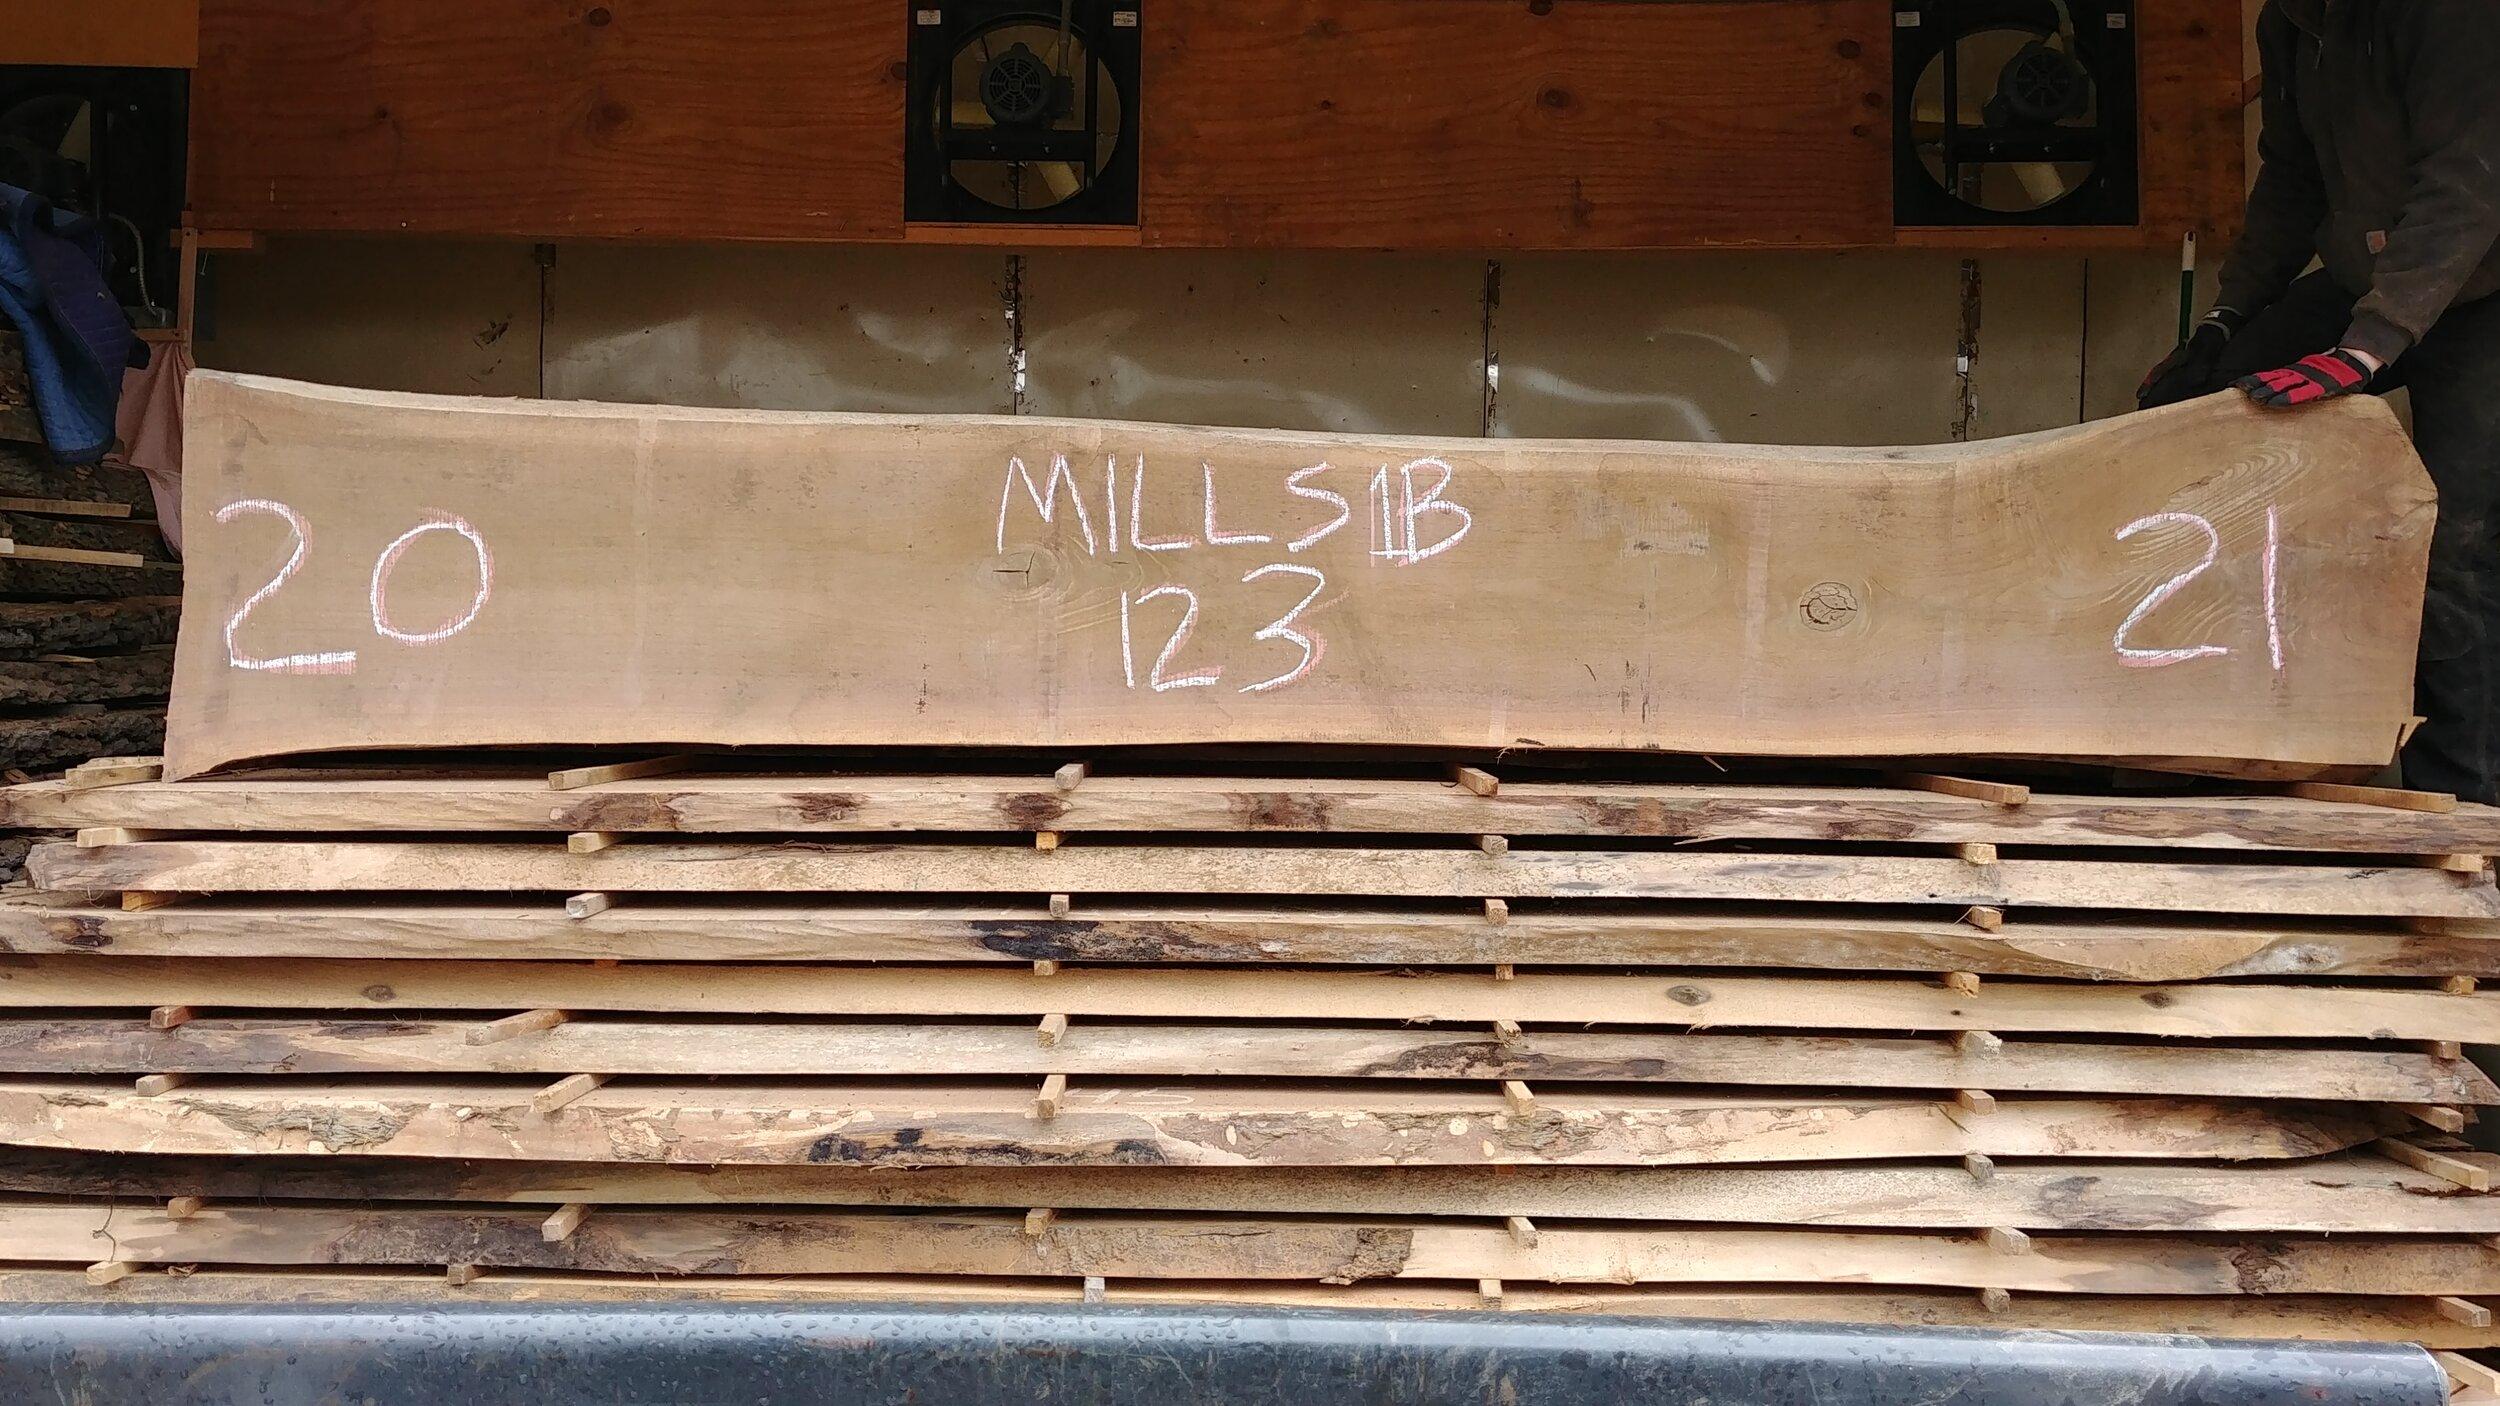 Mills 1B.jpg